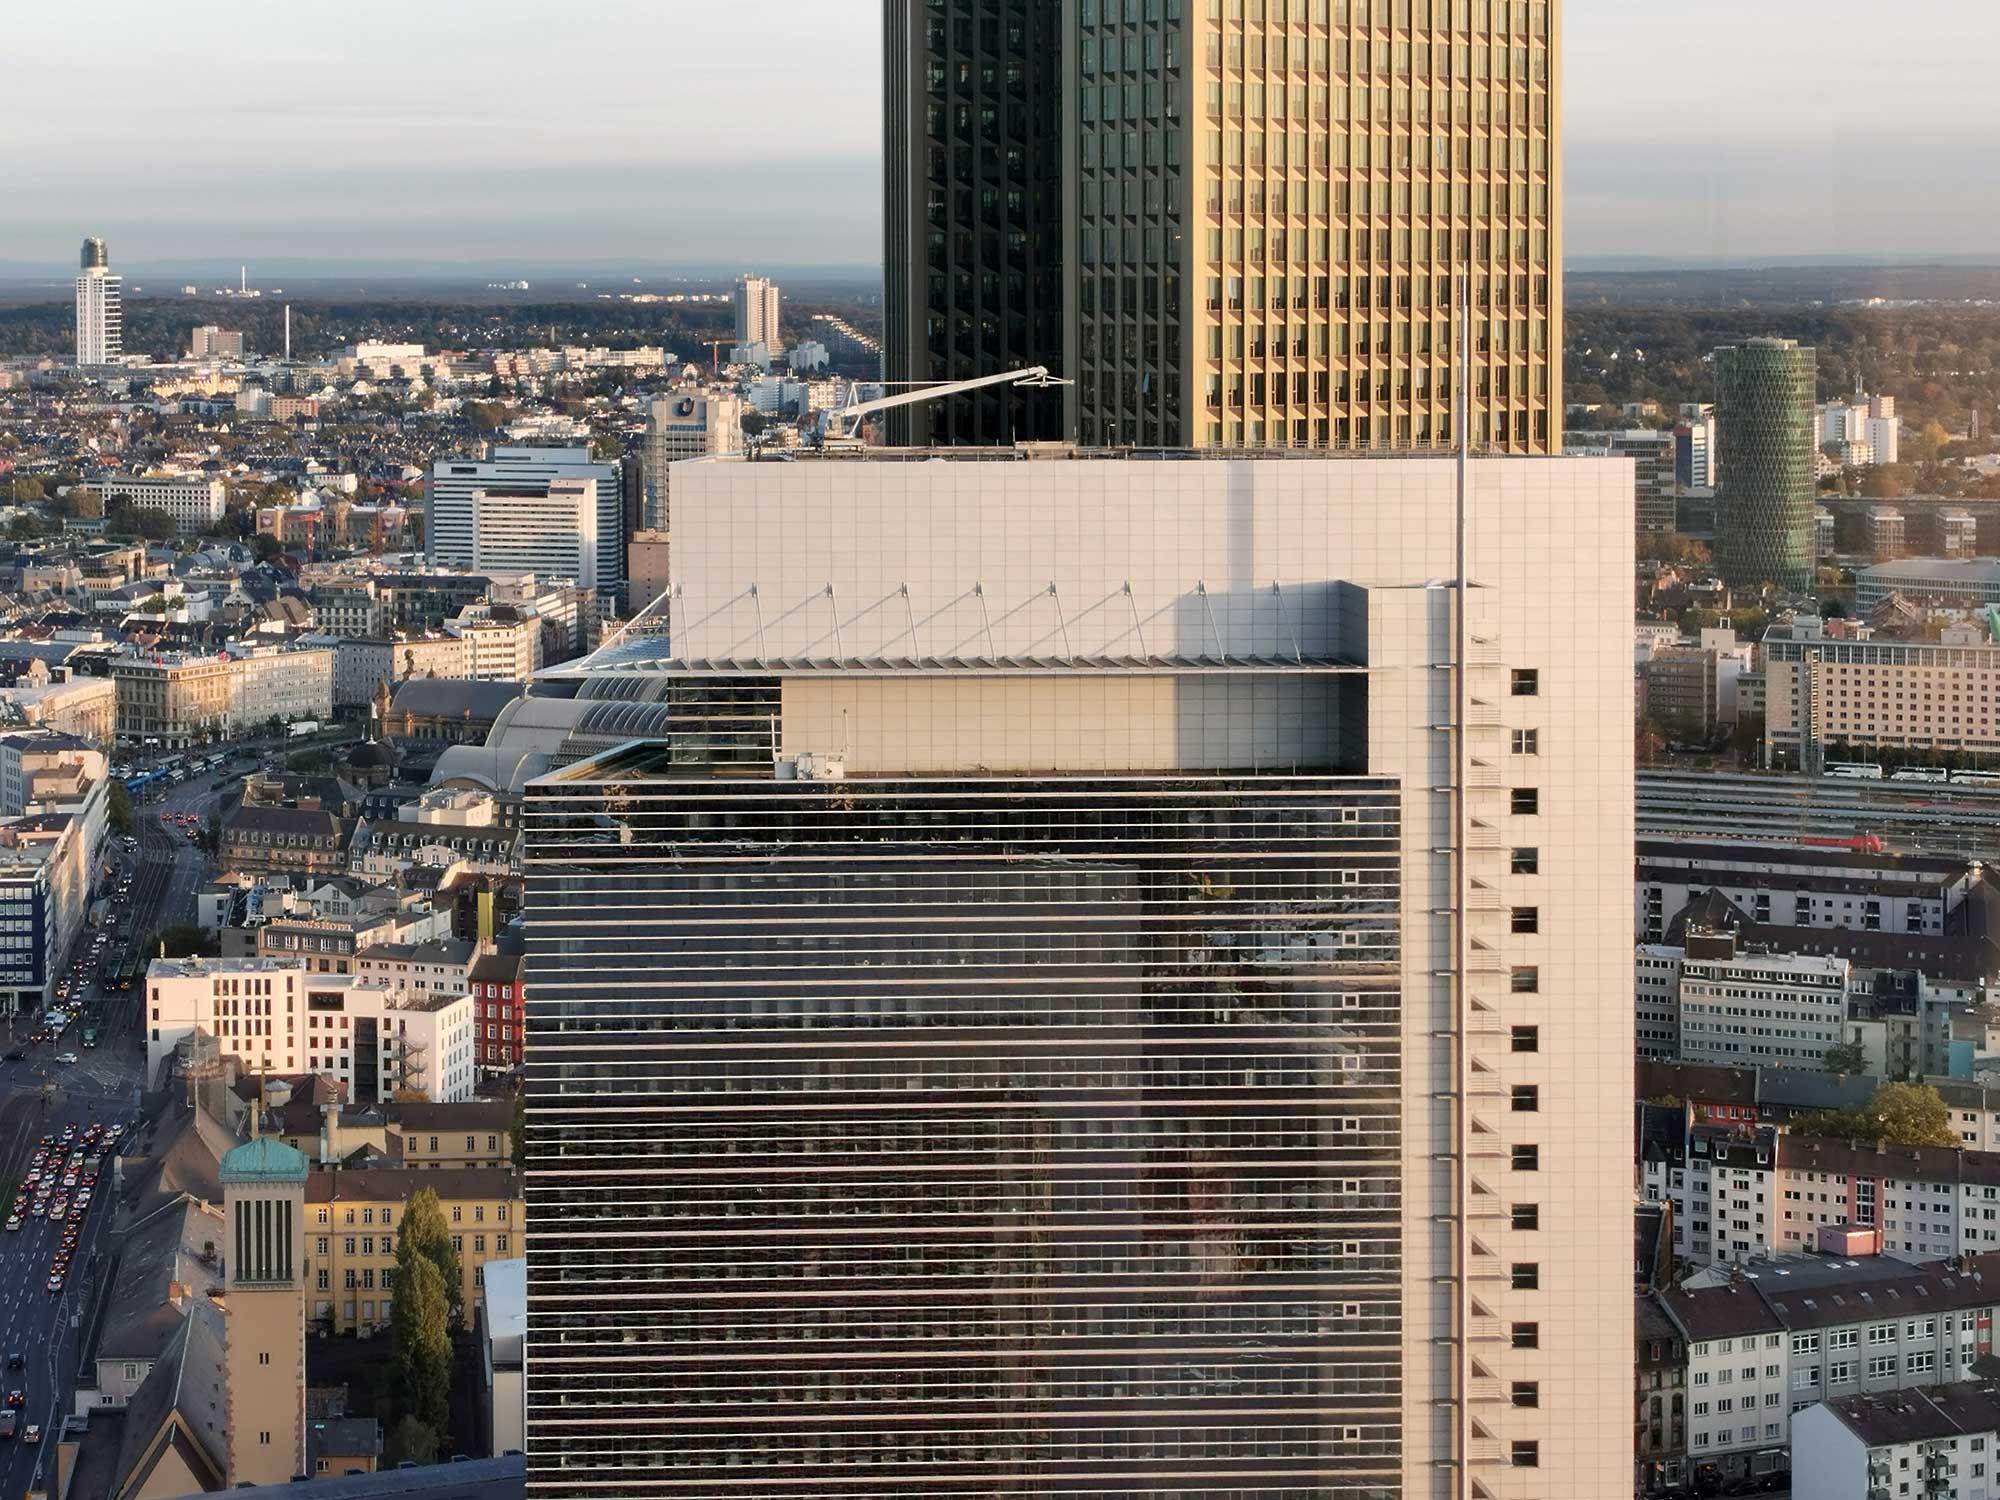 Forum Frankfurt - Pollux Turm Frankfurt am Main von KPF Architekten - Techquartier Sitz Fintech